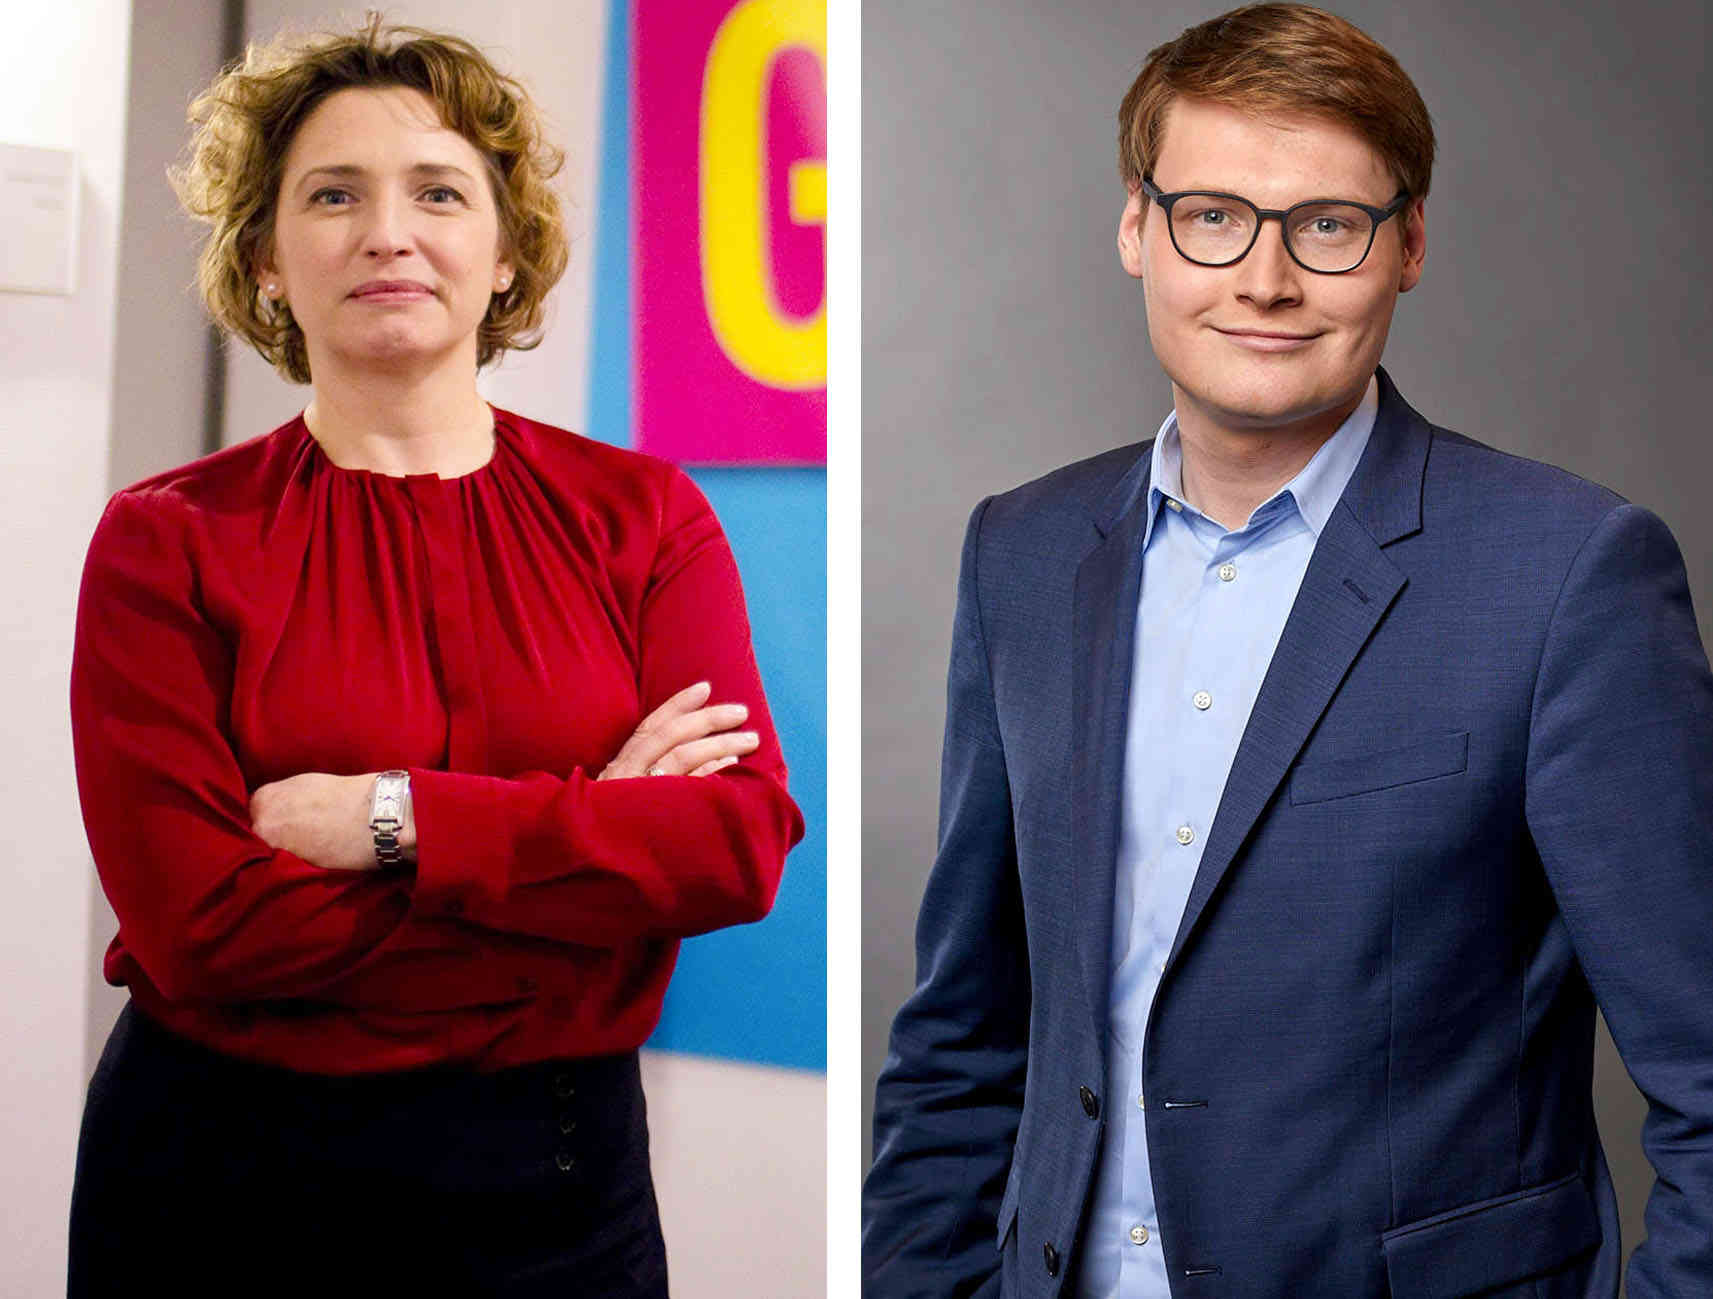 Europawahl Spd Kandidaten